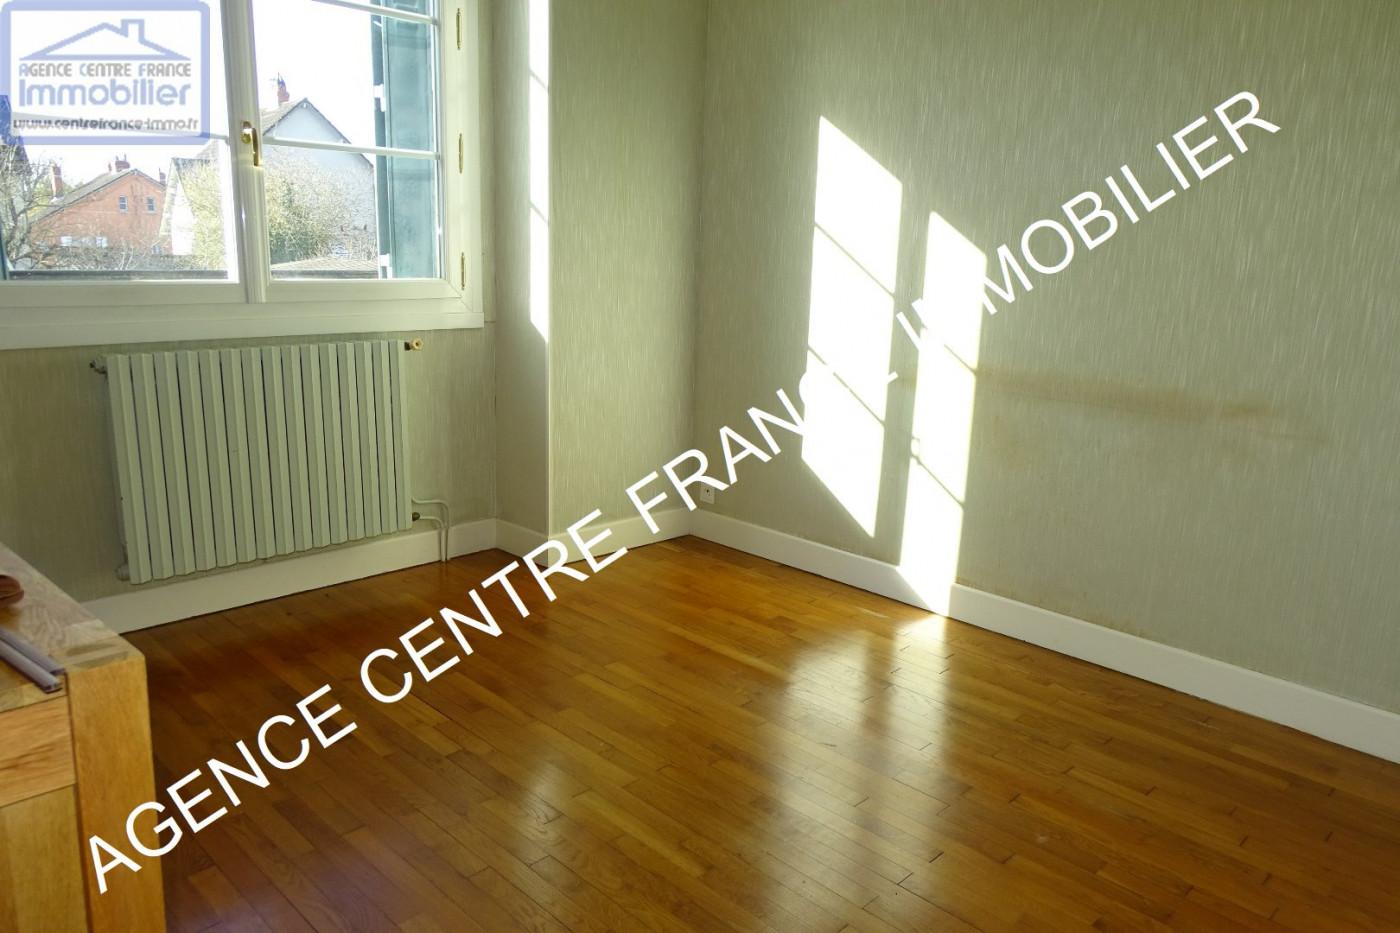 A vendre  Bourges | Réf 030011347 - Agence centre france immobilier